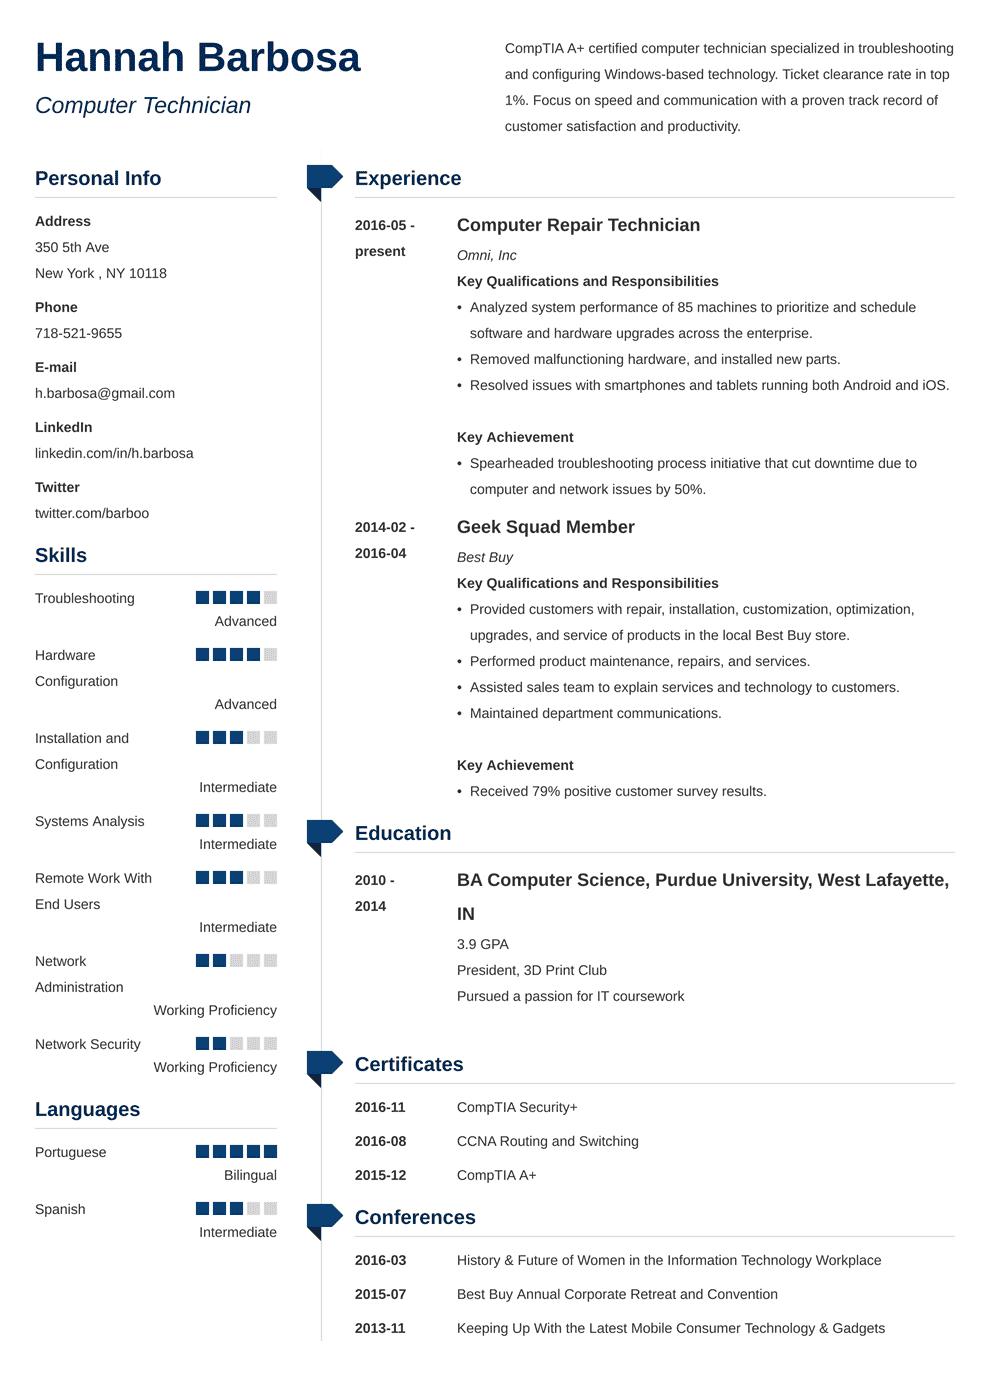 Computer Technician Resume Sample & Job Description